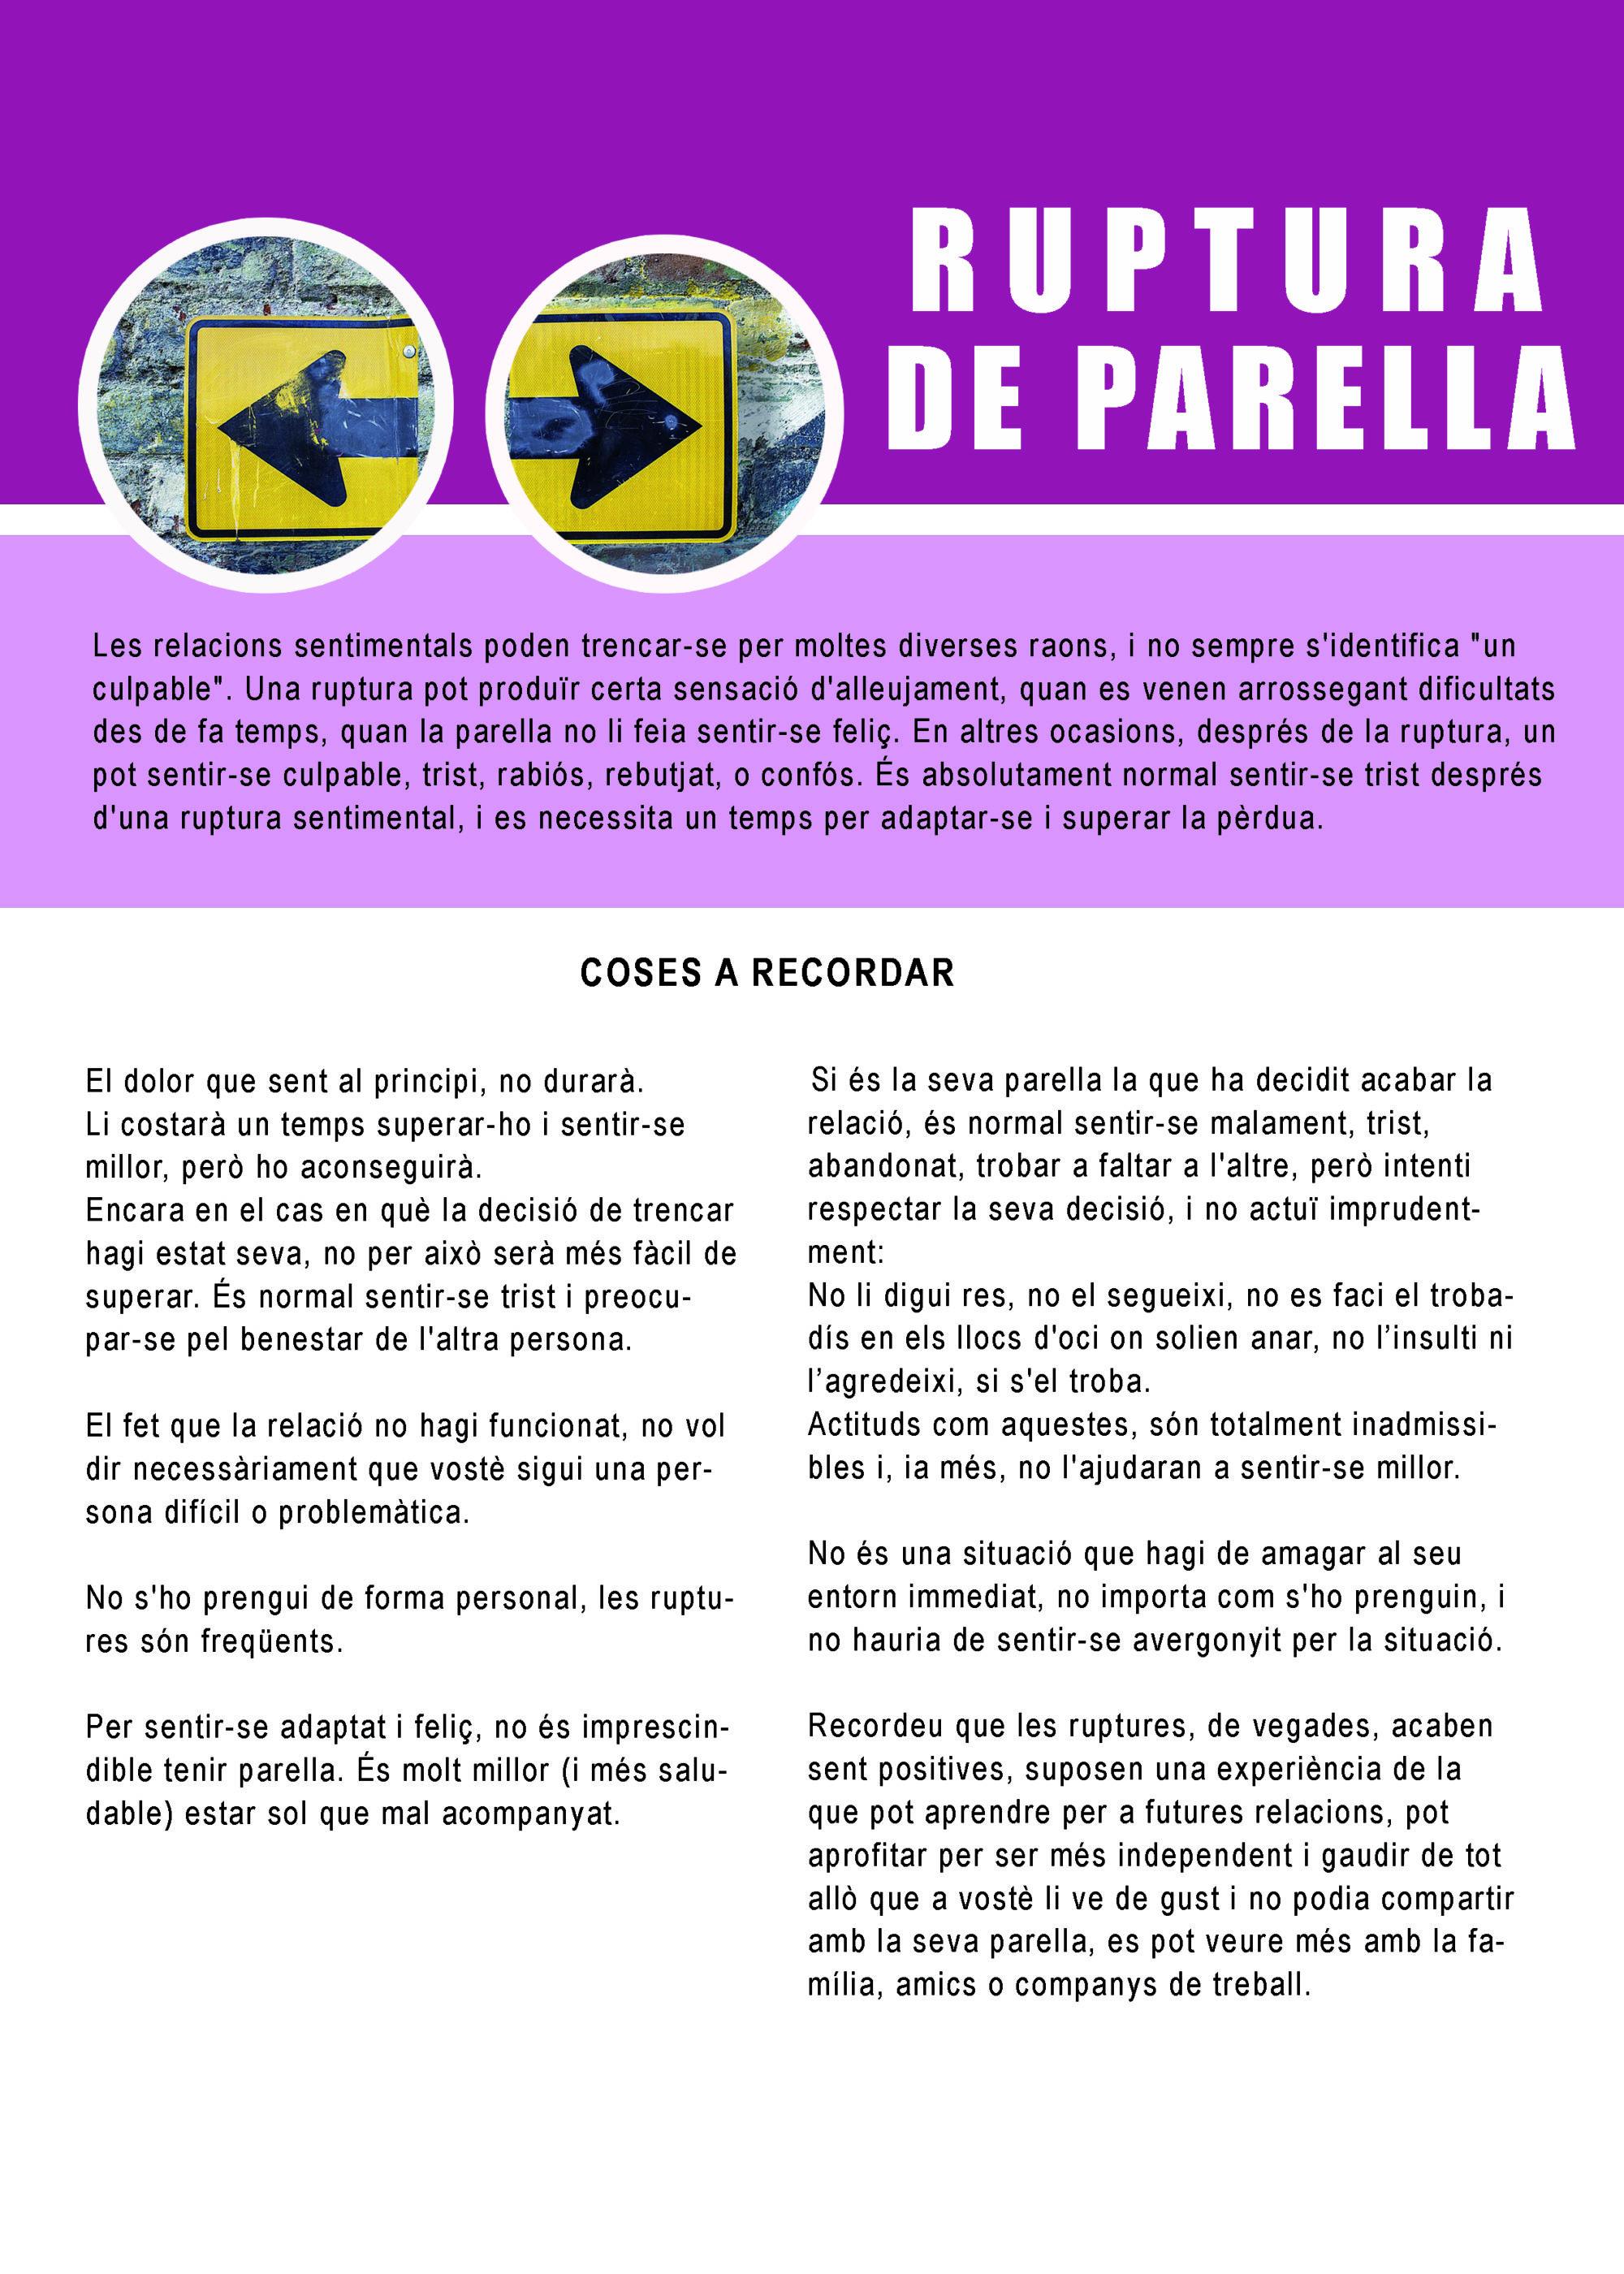 RUPTURA DE PARELLA